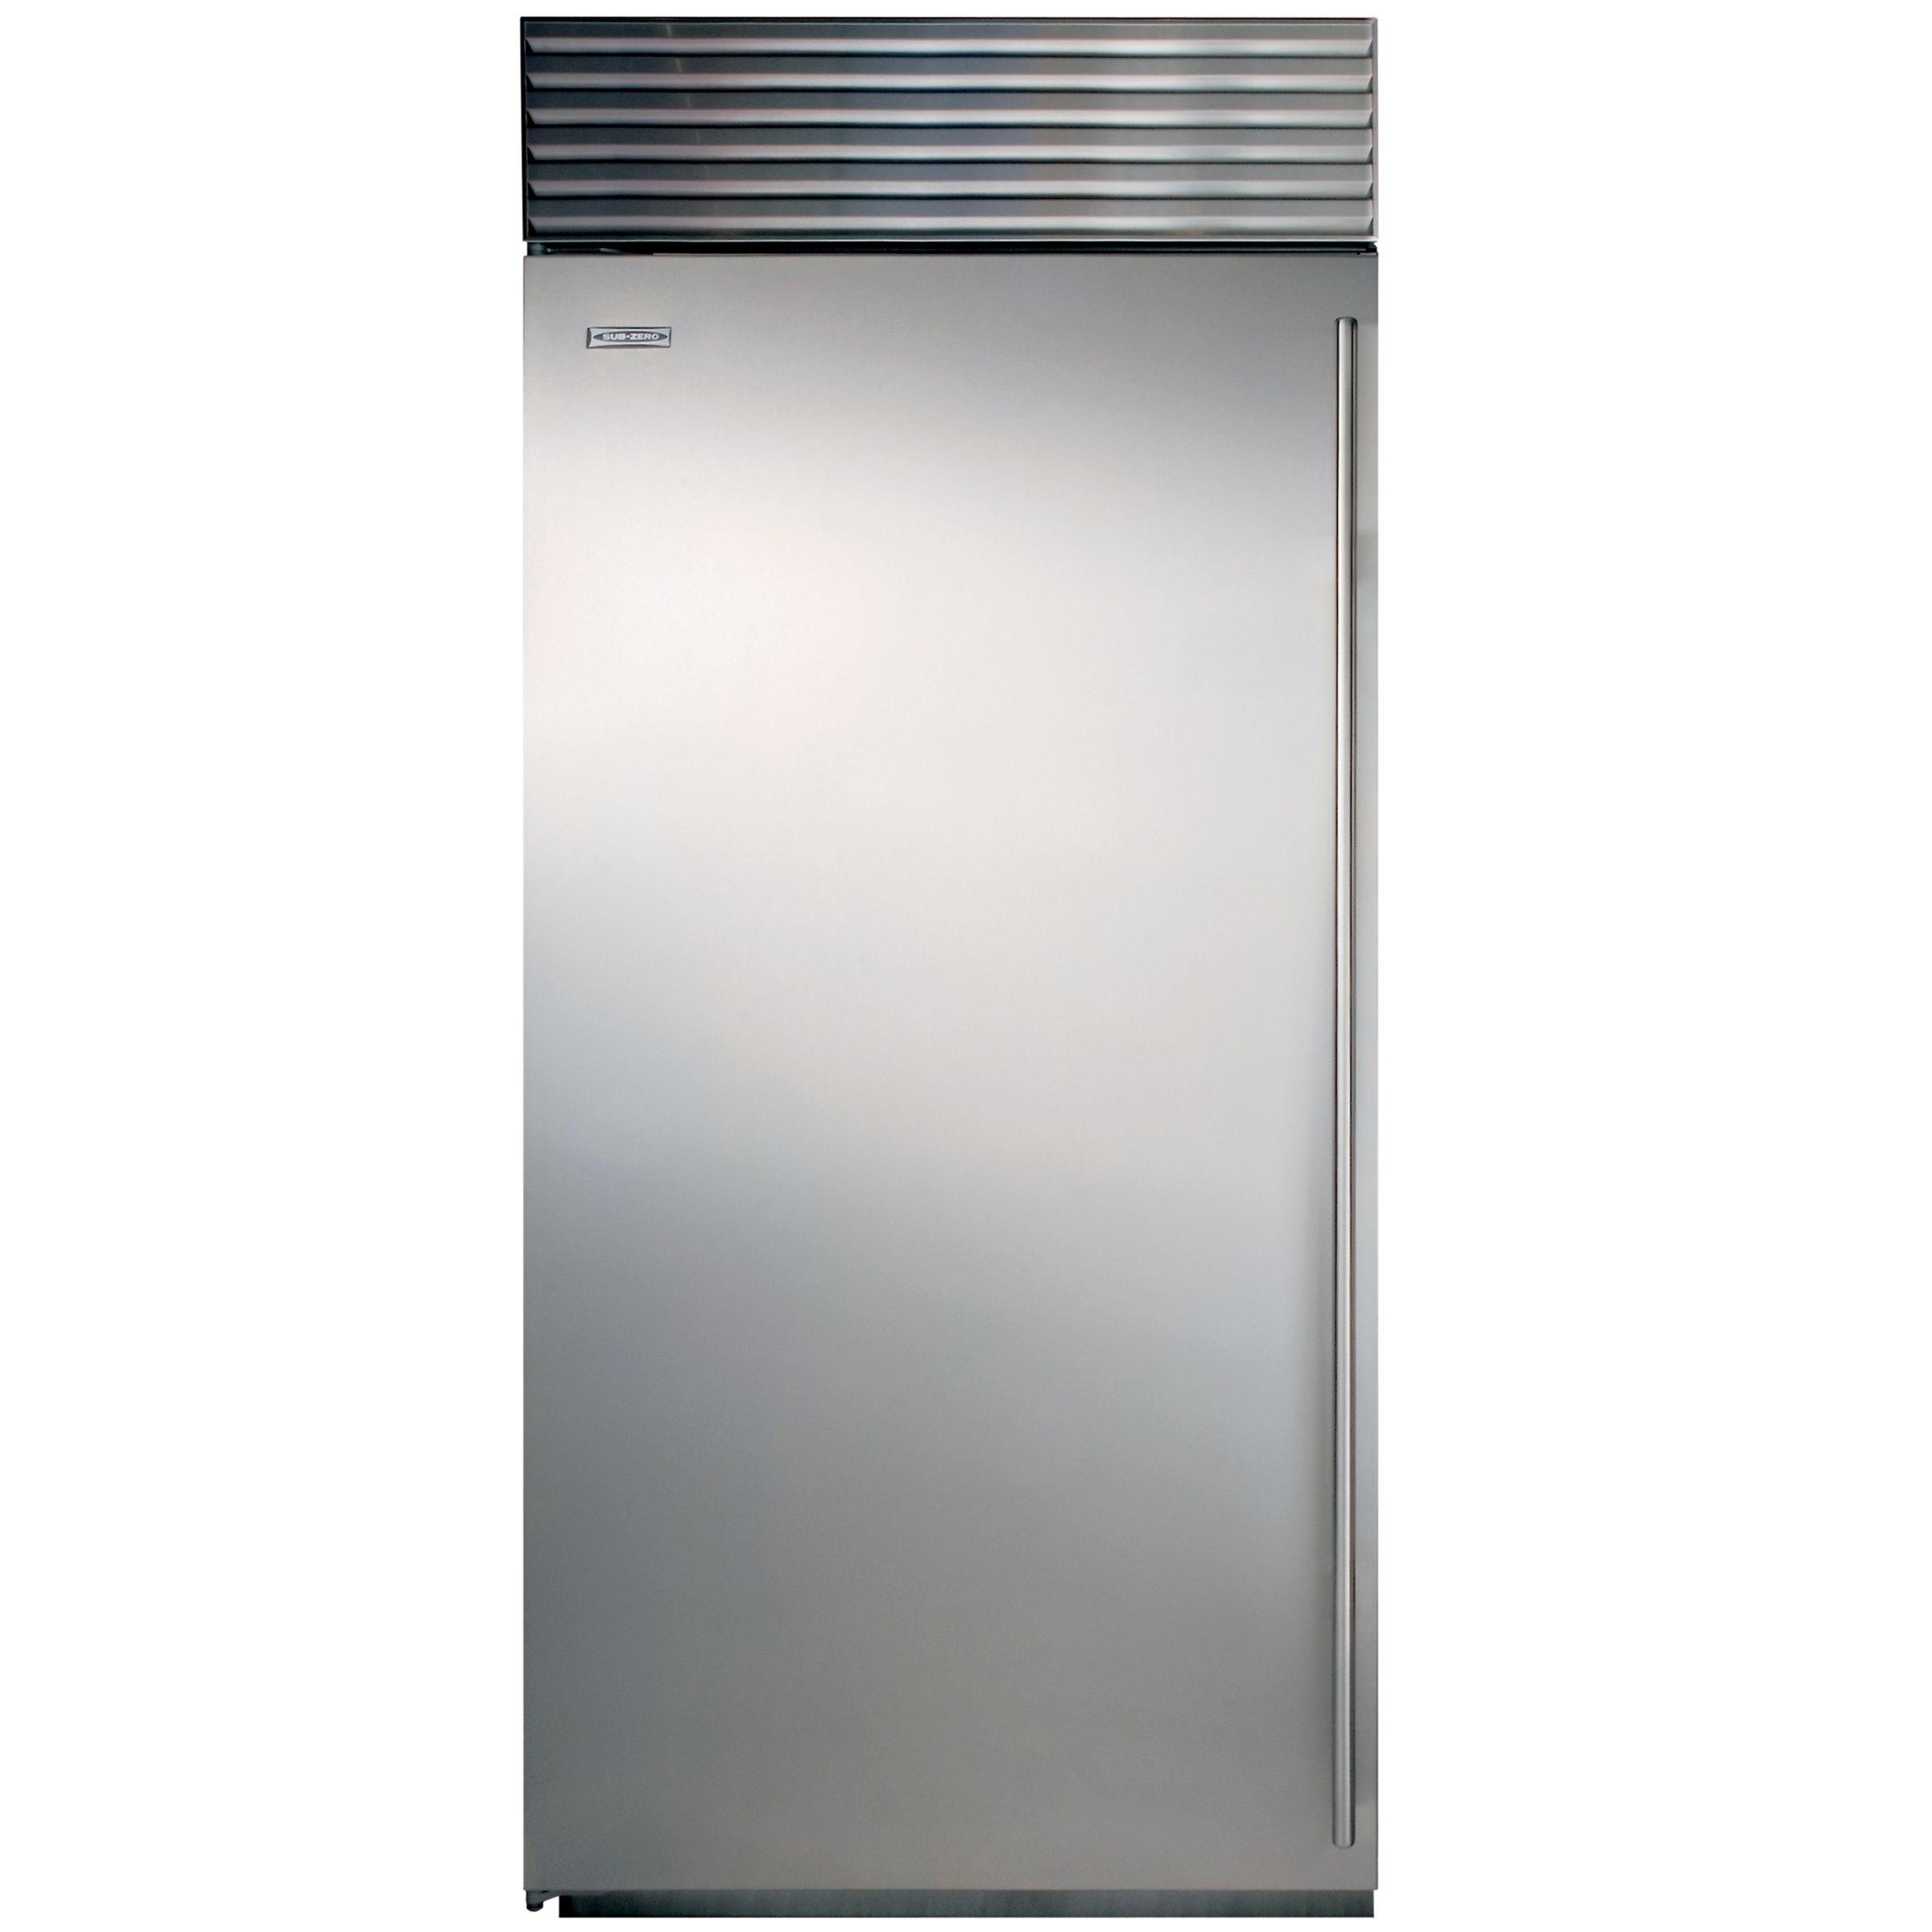 Sub-Zero Sub-Zero ICBBI36F/S/TH/LH Freezer, A+ Energy Rating, 91cm Wide, Stainless Steel